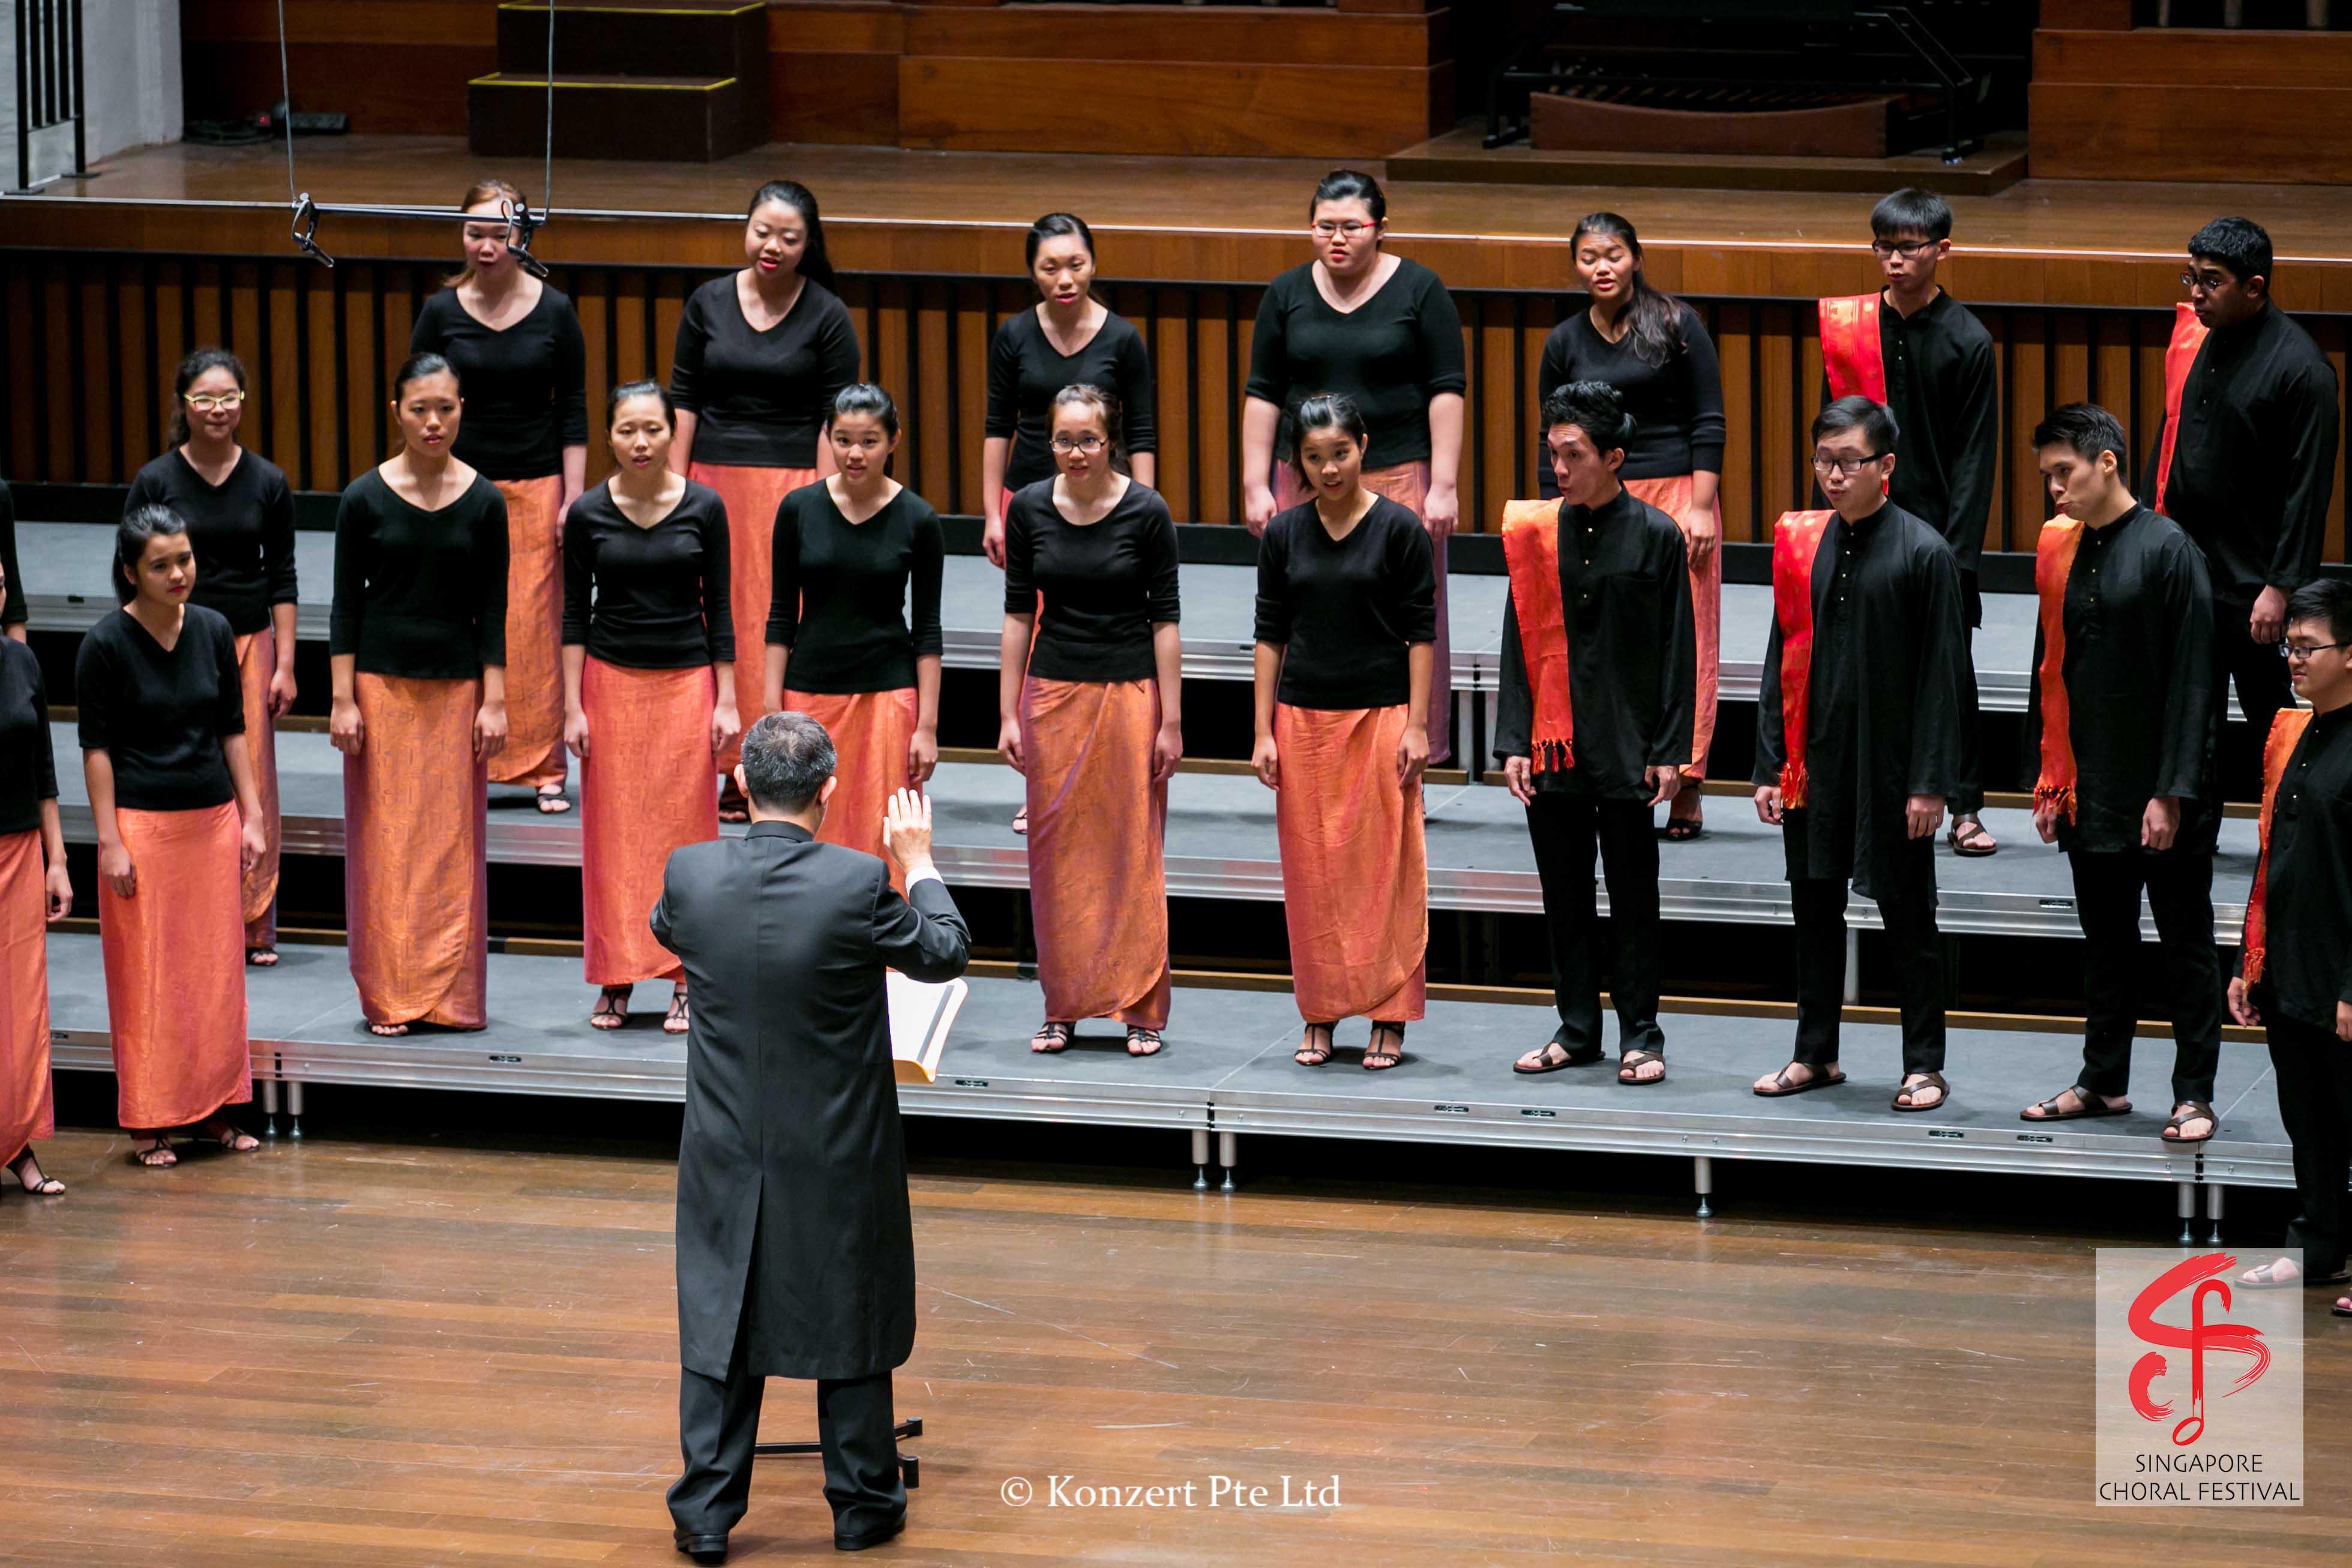 Singapore Choral Festival 7-8-15 (293).jpg